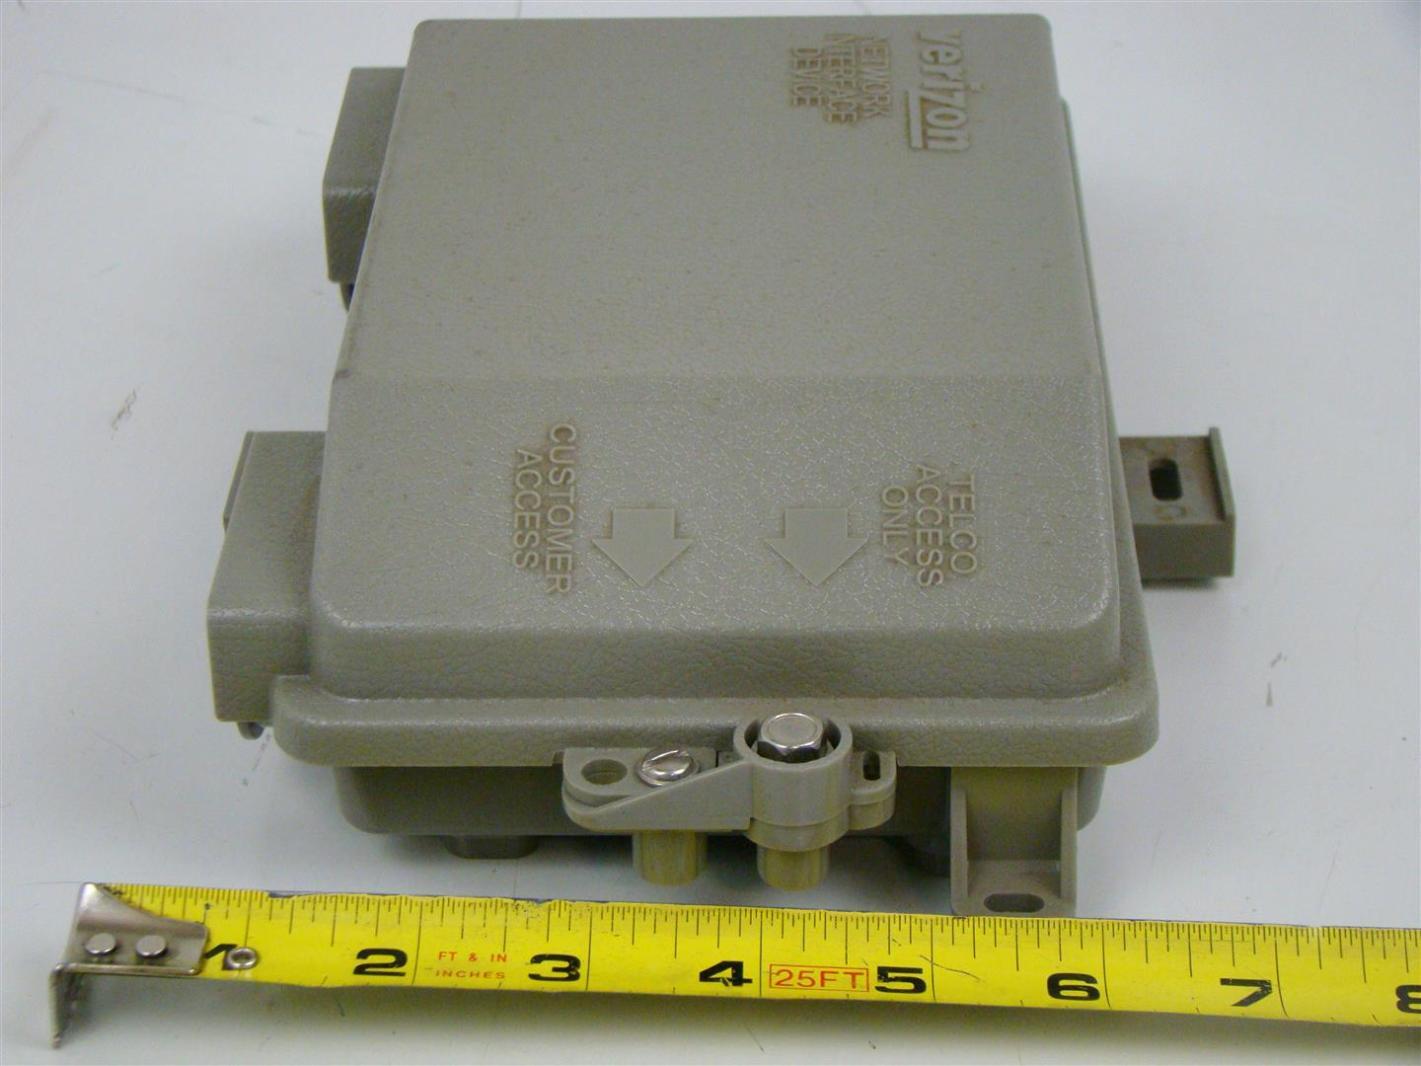 hight resolution of verizon network interface device panel box 3712h 71 2l01